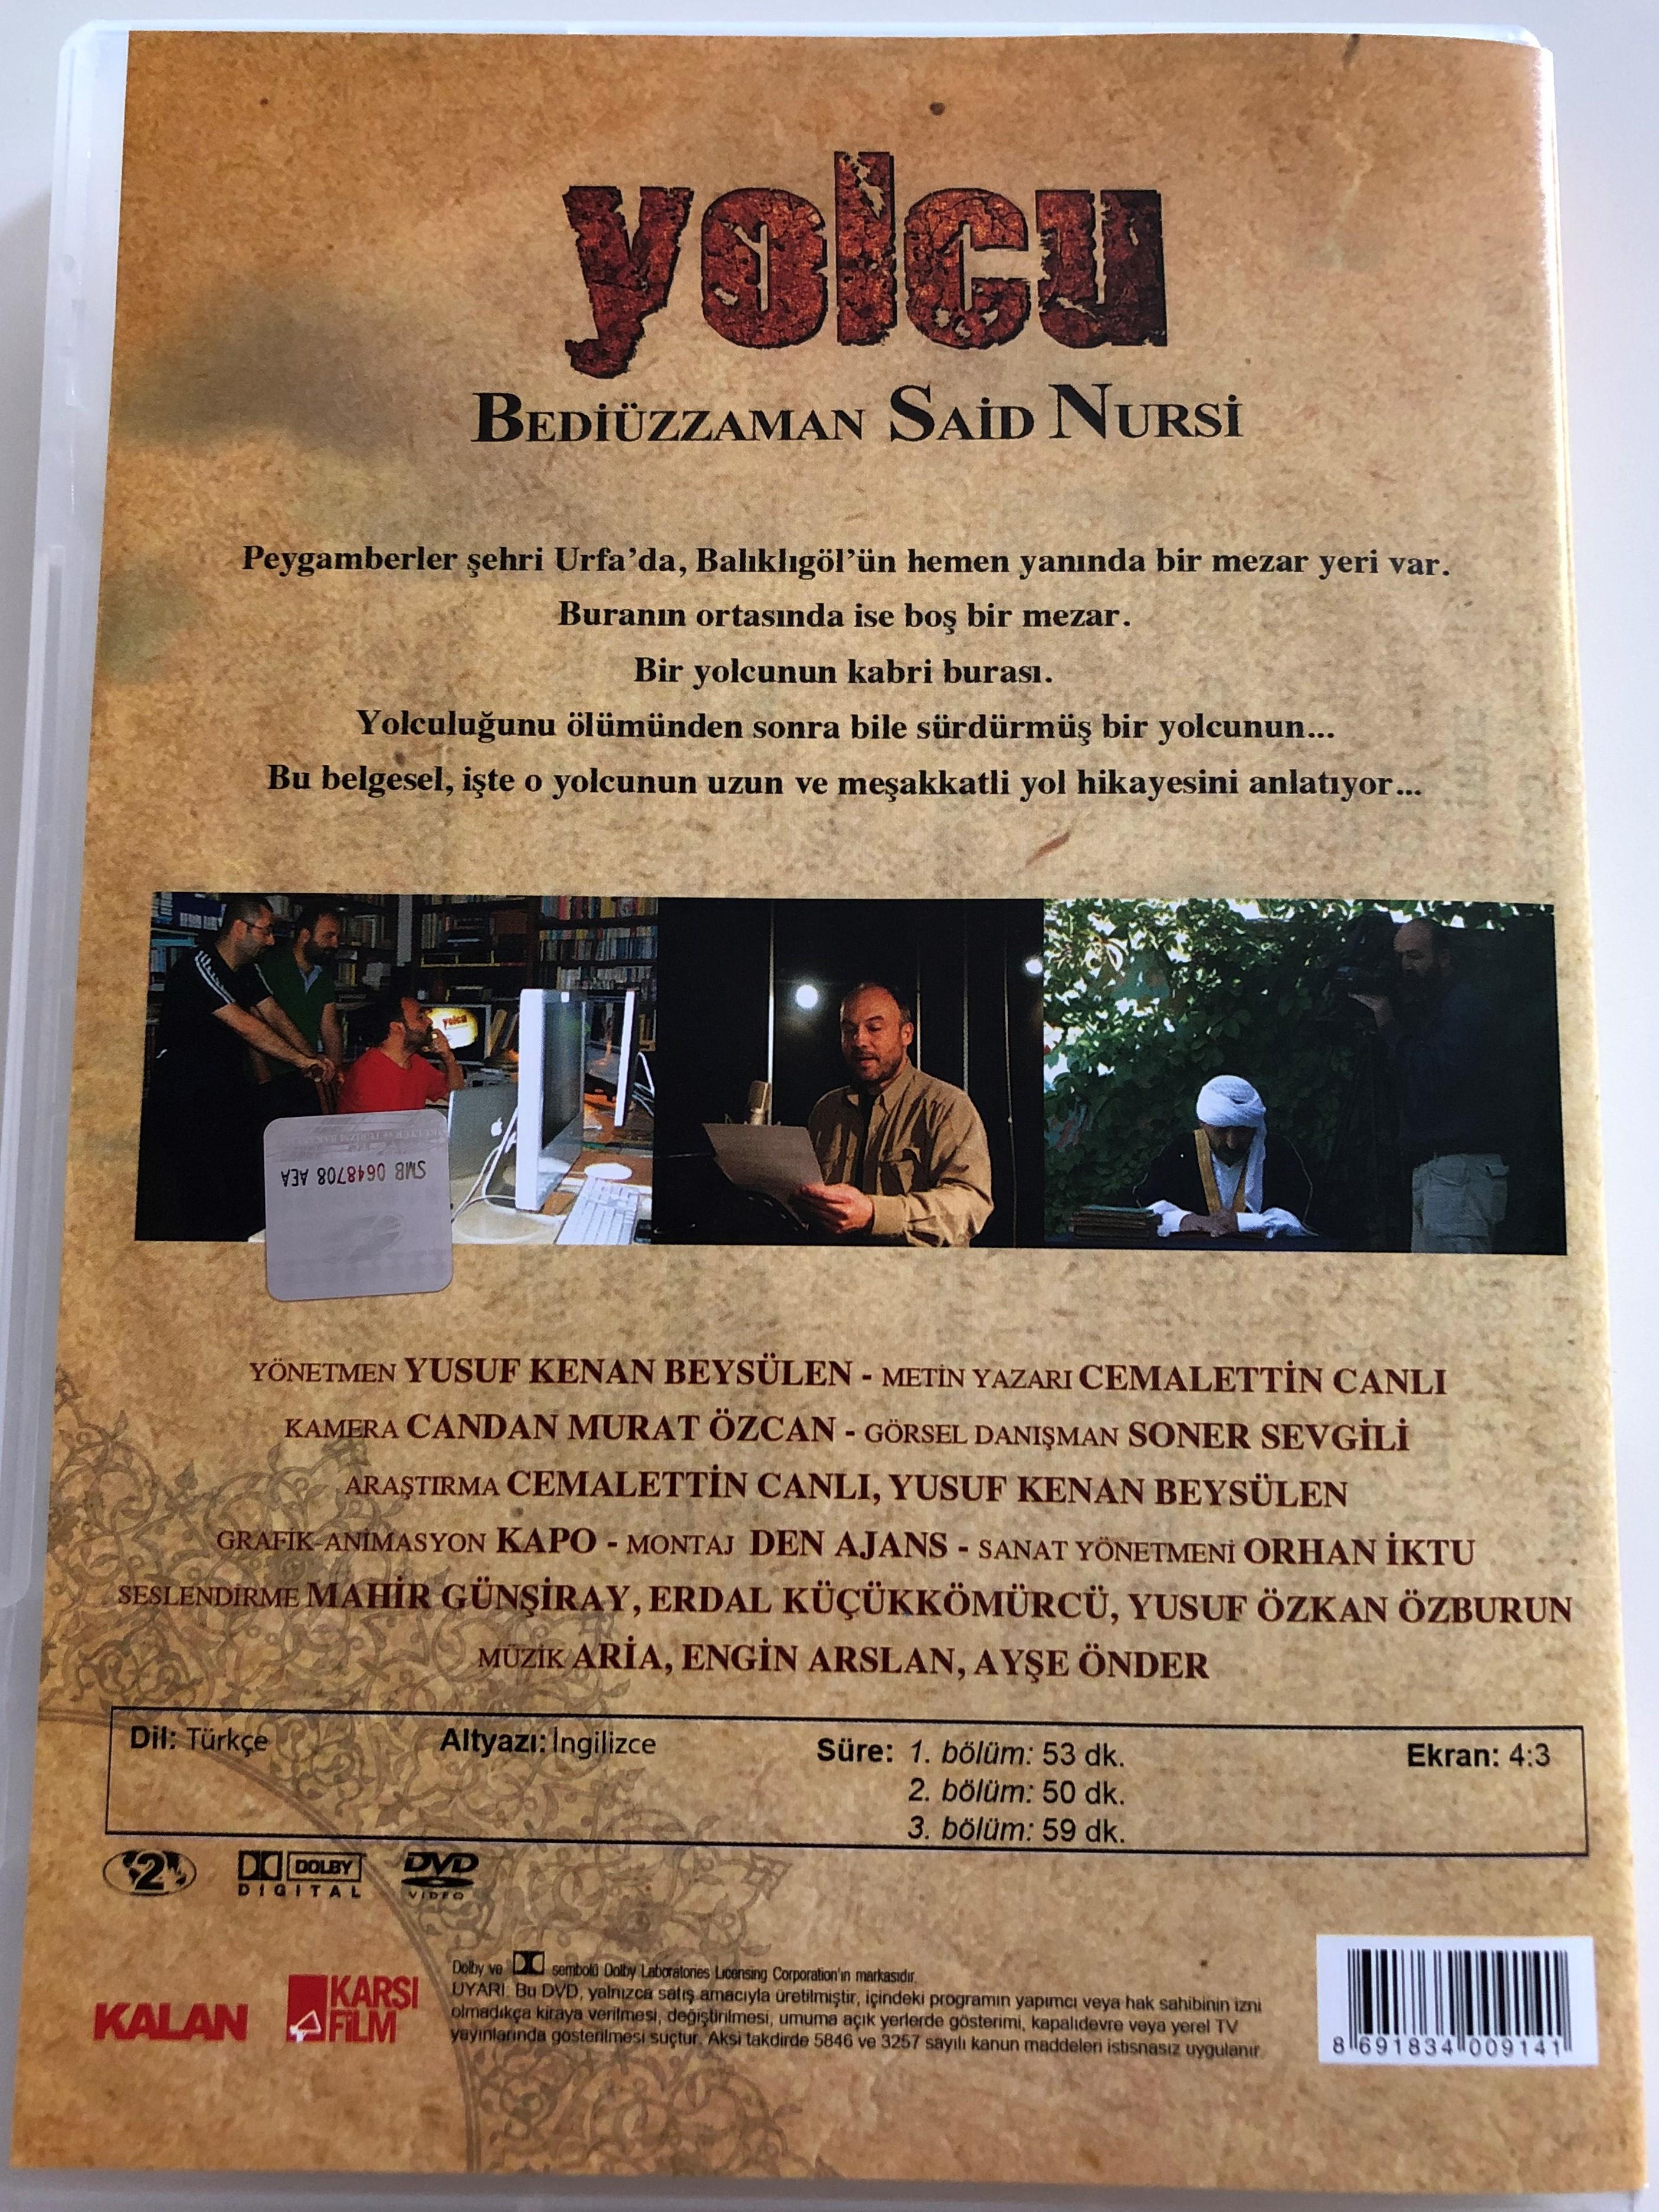 -yolcu-bedi-zzaman-said-nursi-dvd-1994-passenger-directed-by-yusuf-kenan-beys-len-2-.jpg